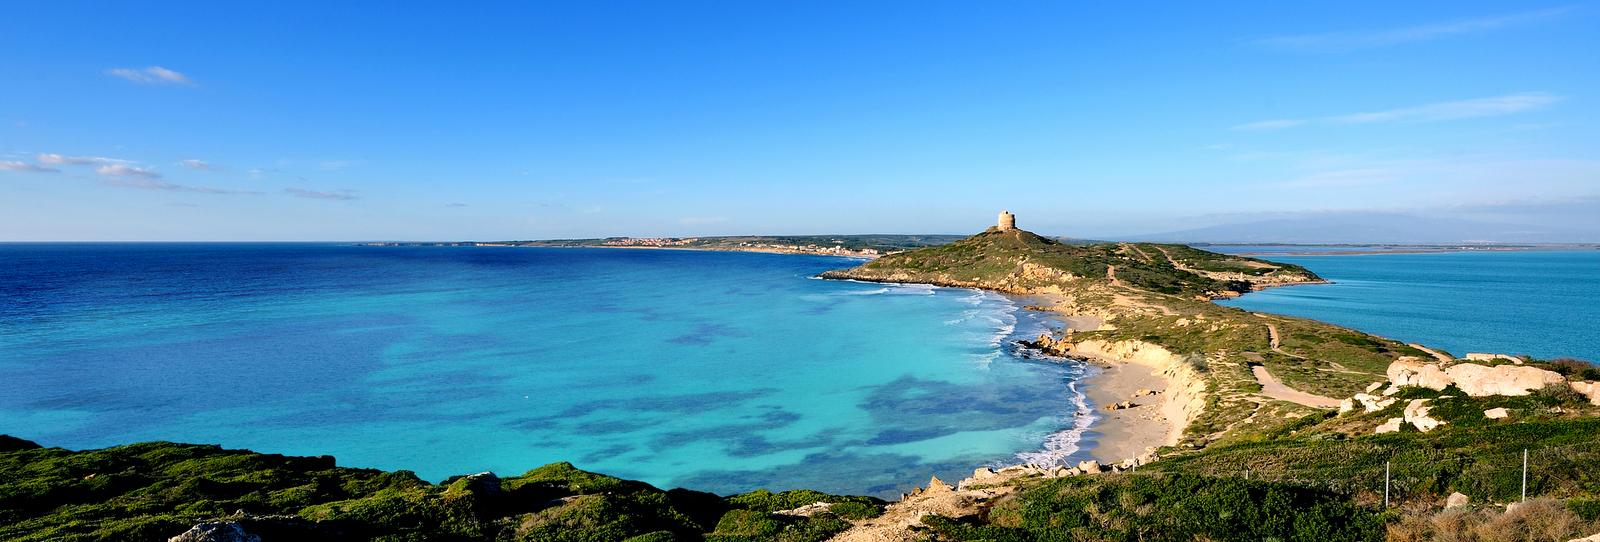 Nieddittas scelta da Med Sea come best practices